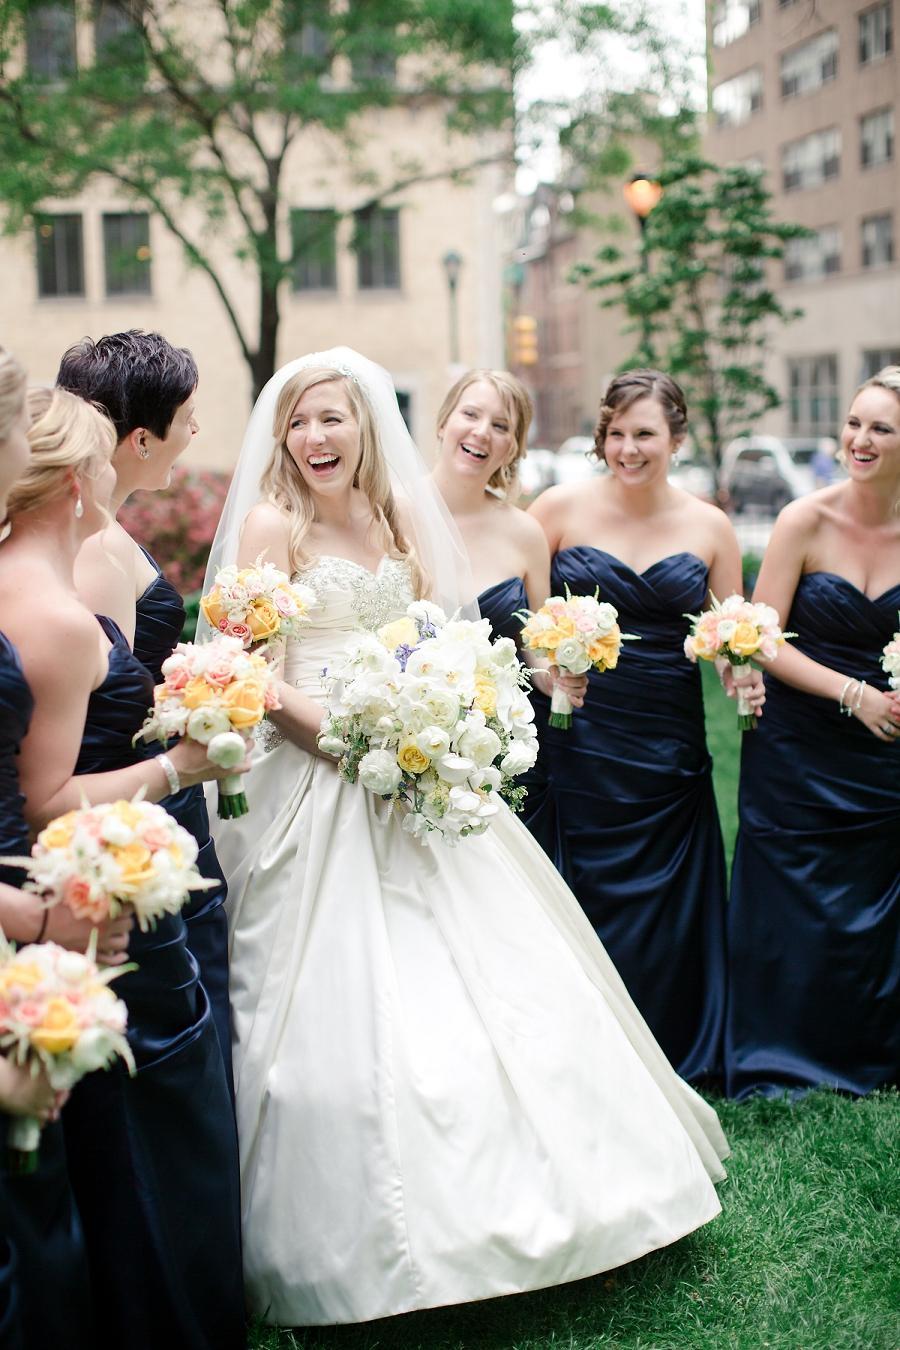 Pyramid-Club-Philadelphia-Wedding-by-Adrienne-Matz-Photography_0063